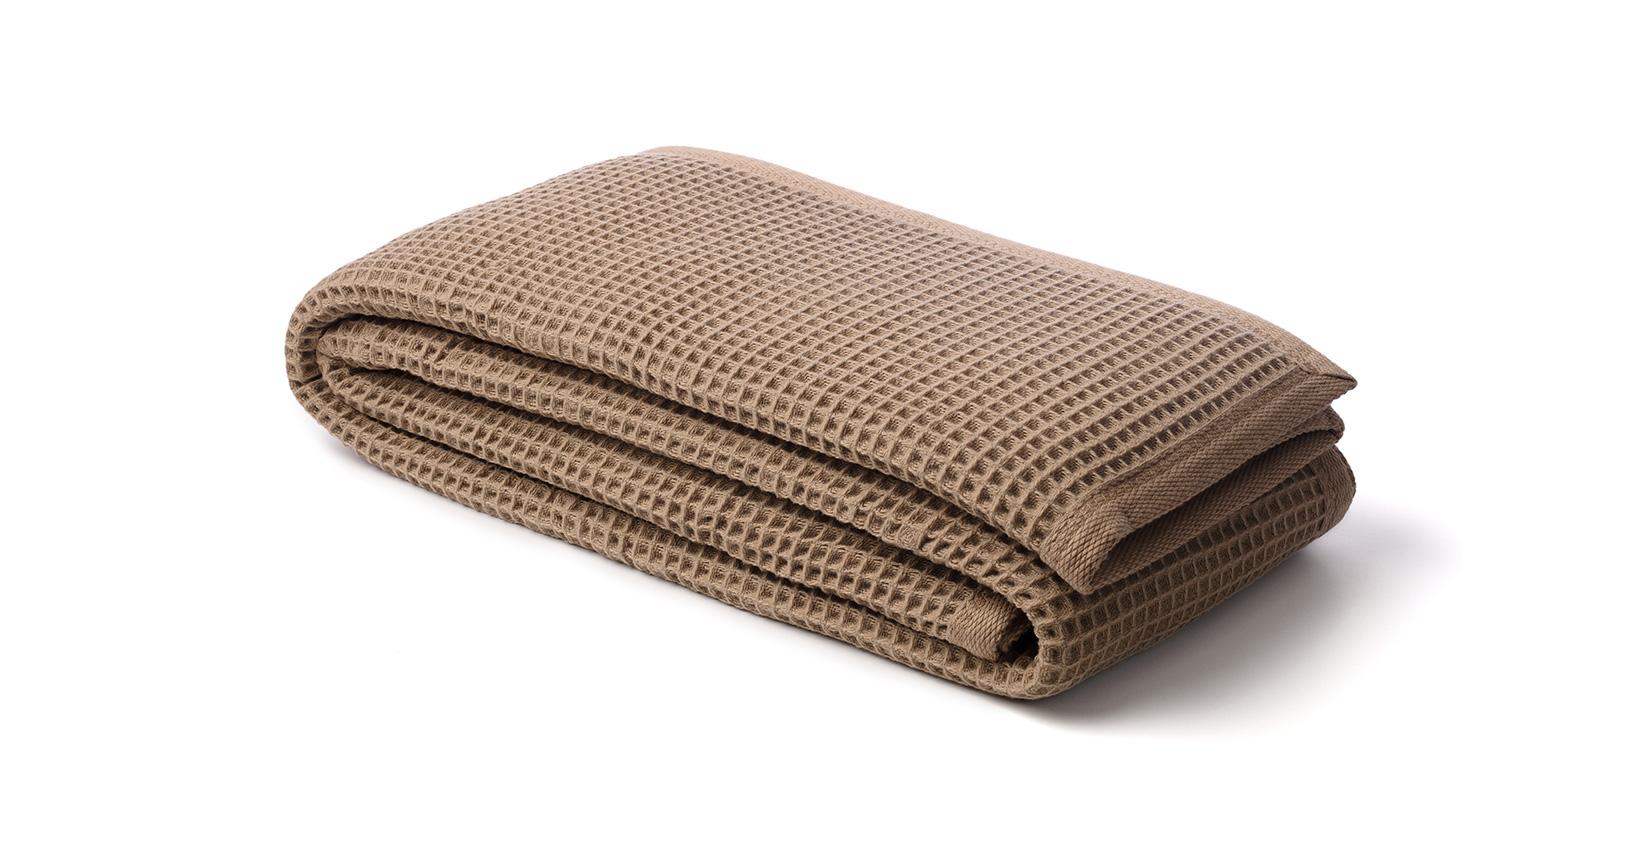 Blankets, cobertores - Waffle